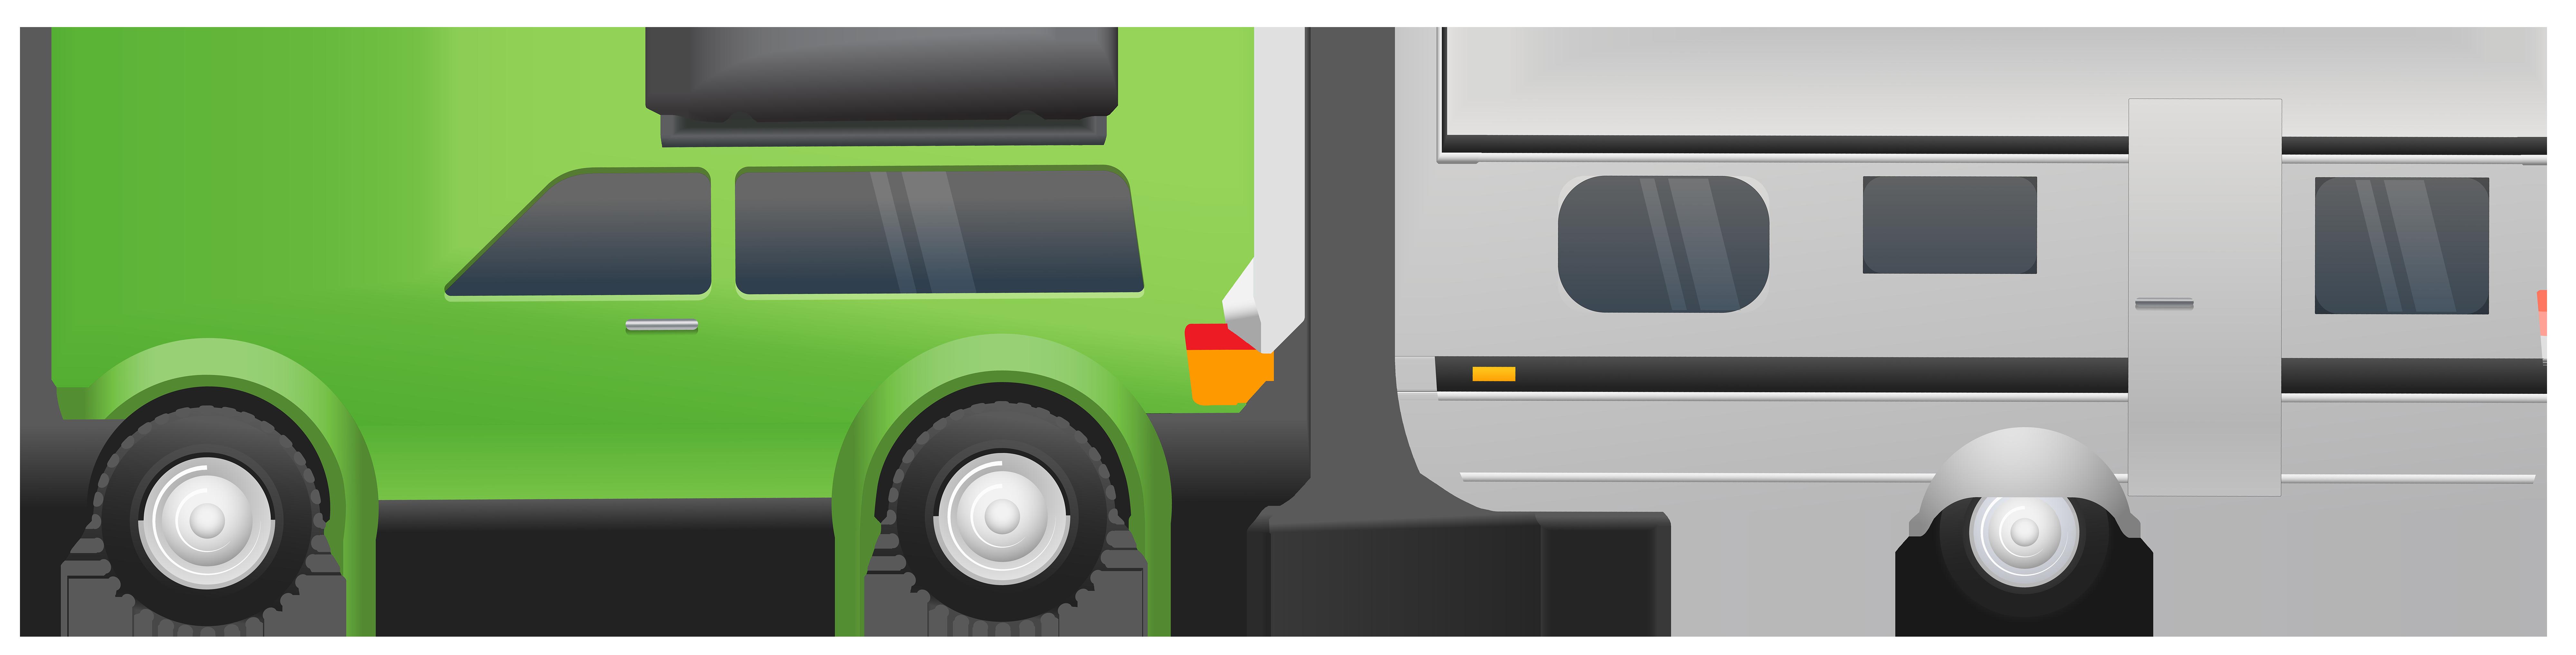 Clipart halloween car. With caravan clip art